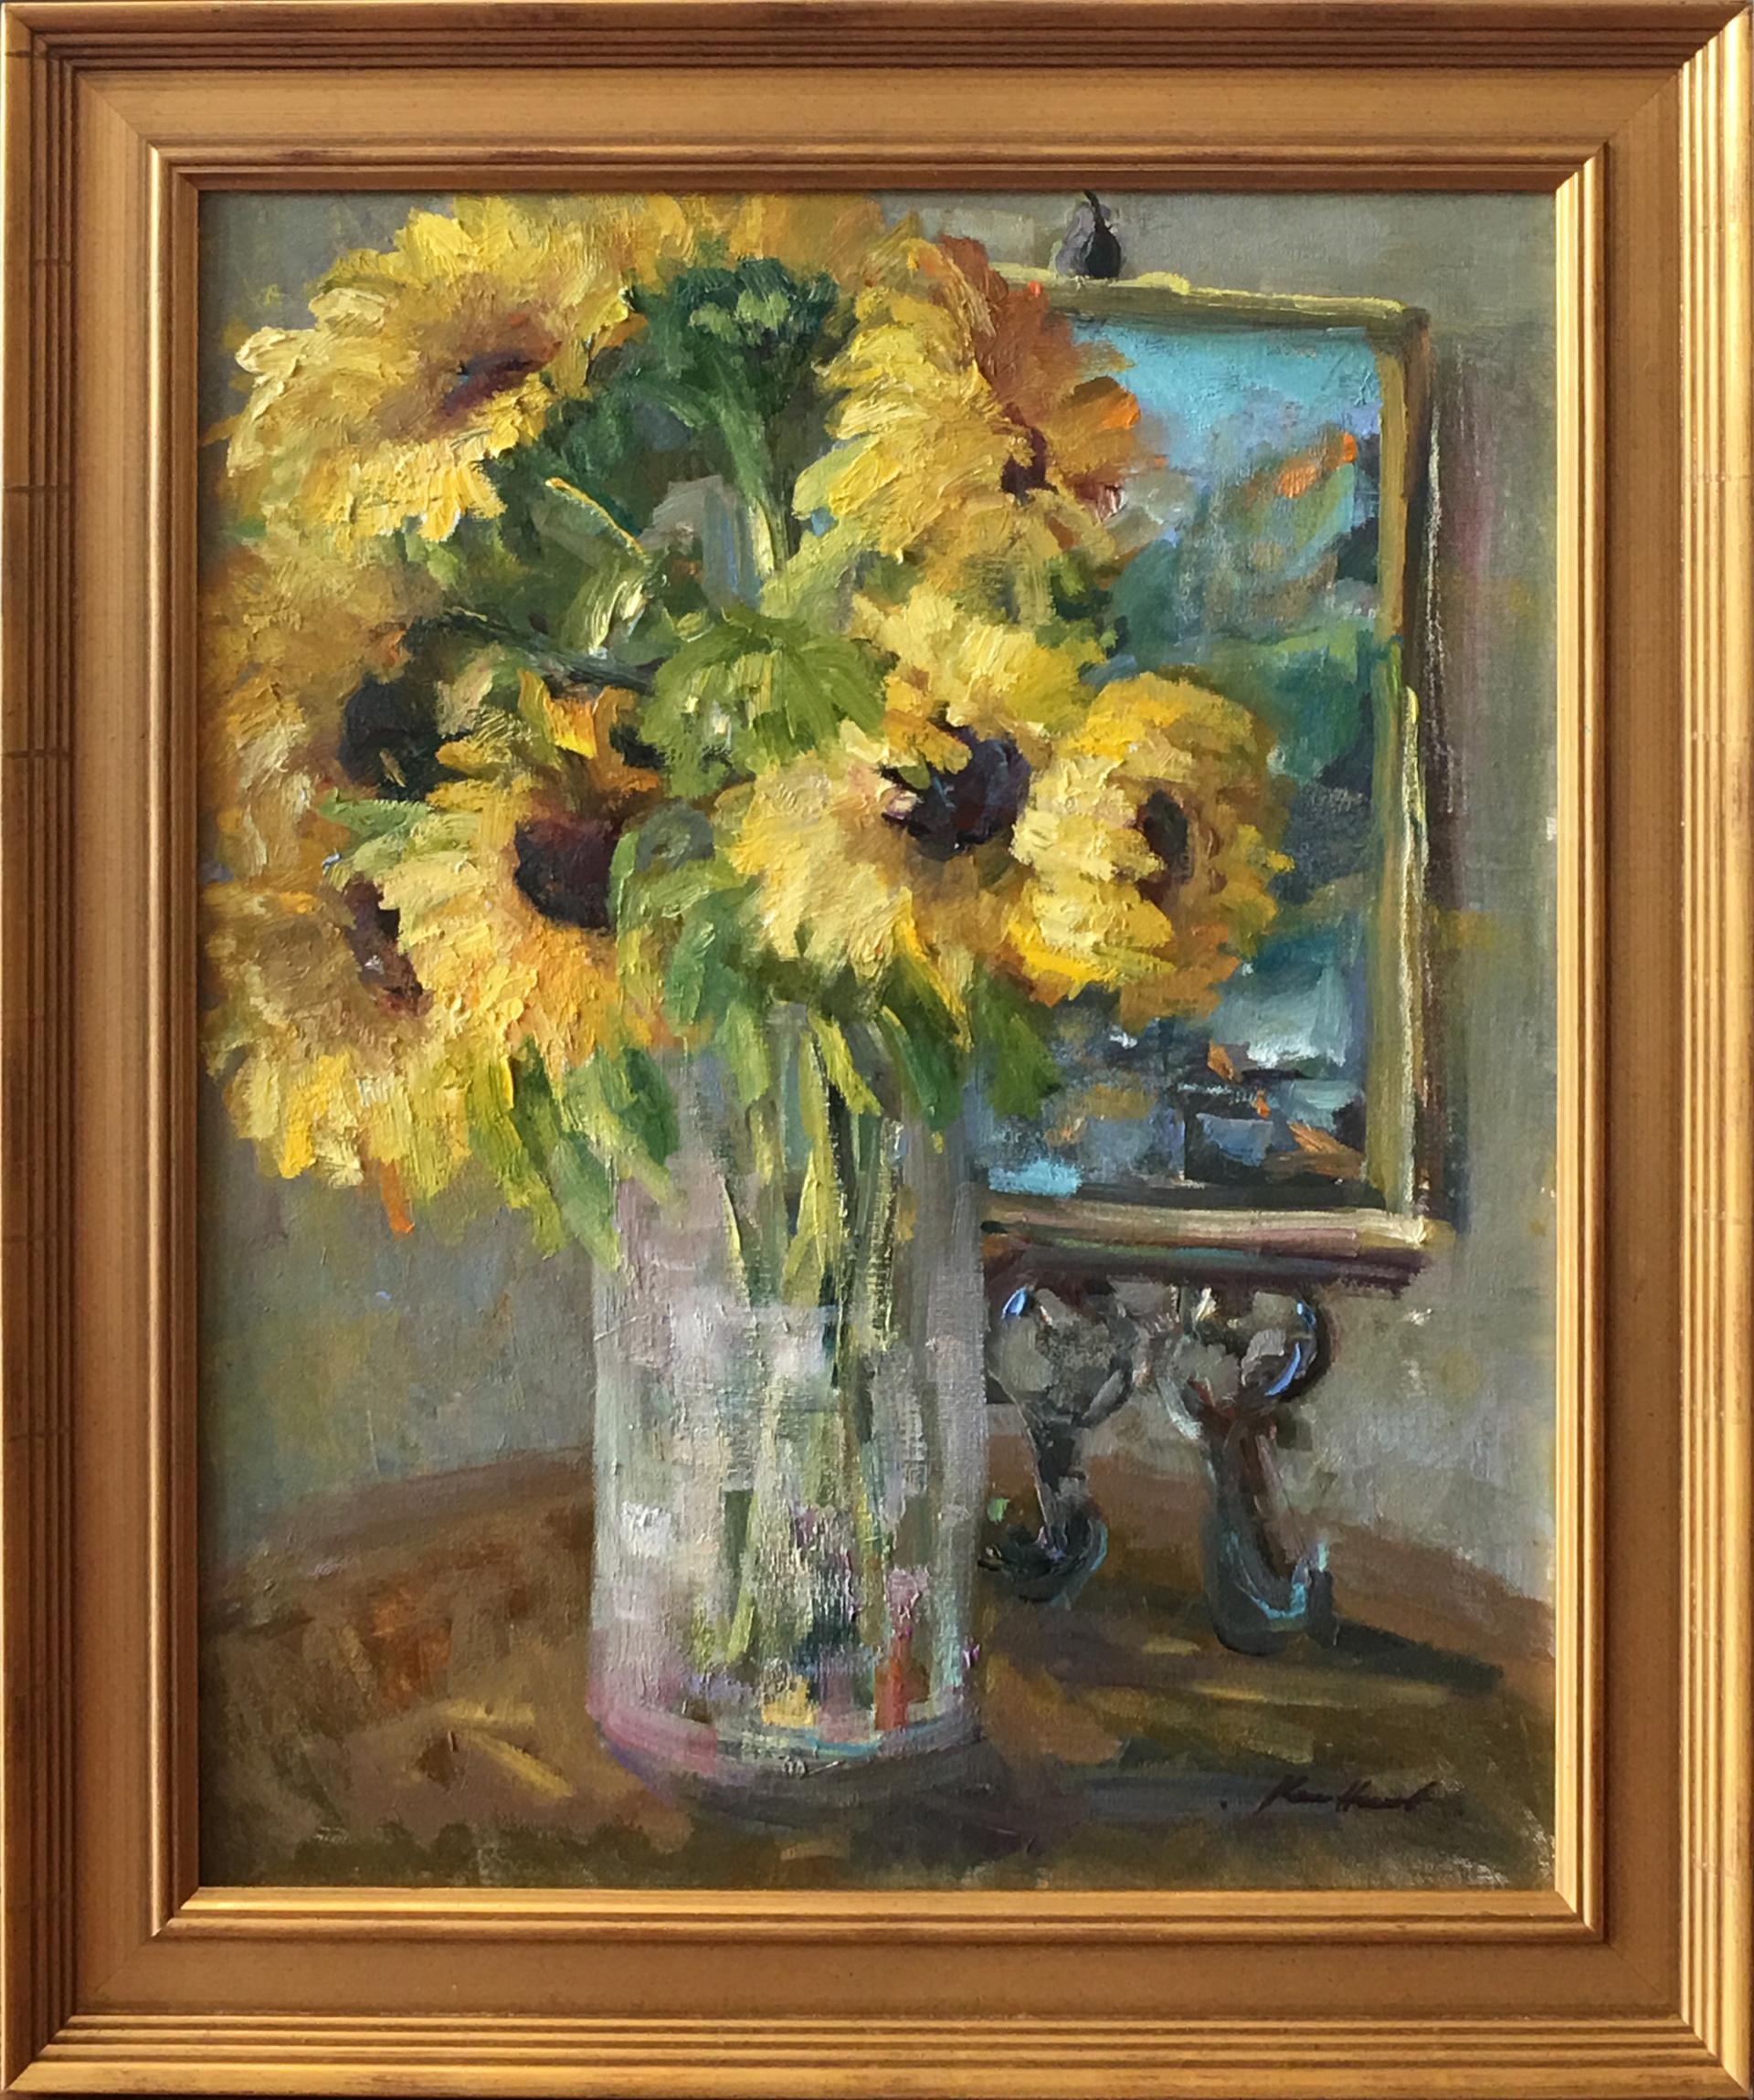 Sunflowers in the Grand Salon by Karen Hewitt Hagan